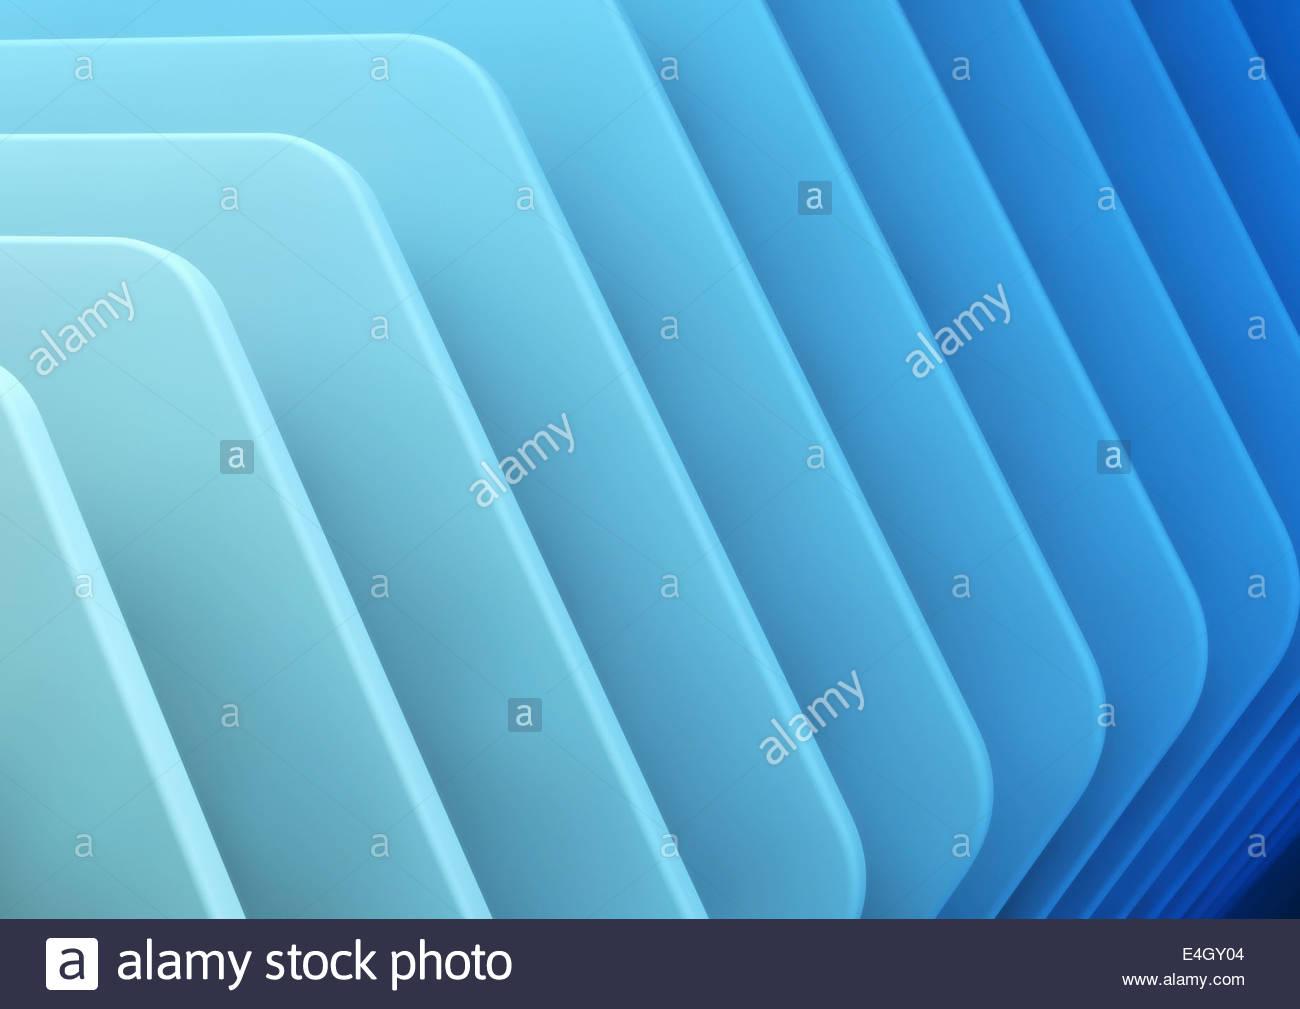 Abstract full frame pattern Blue Ridge Photo Stock